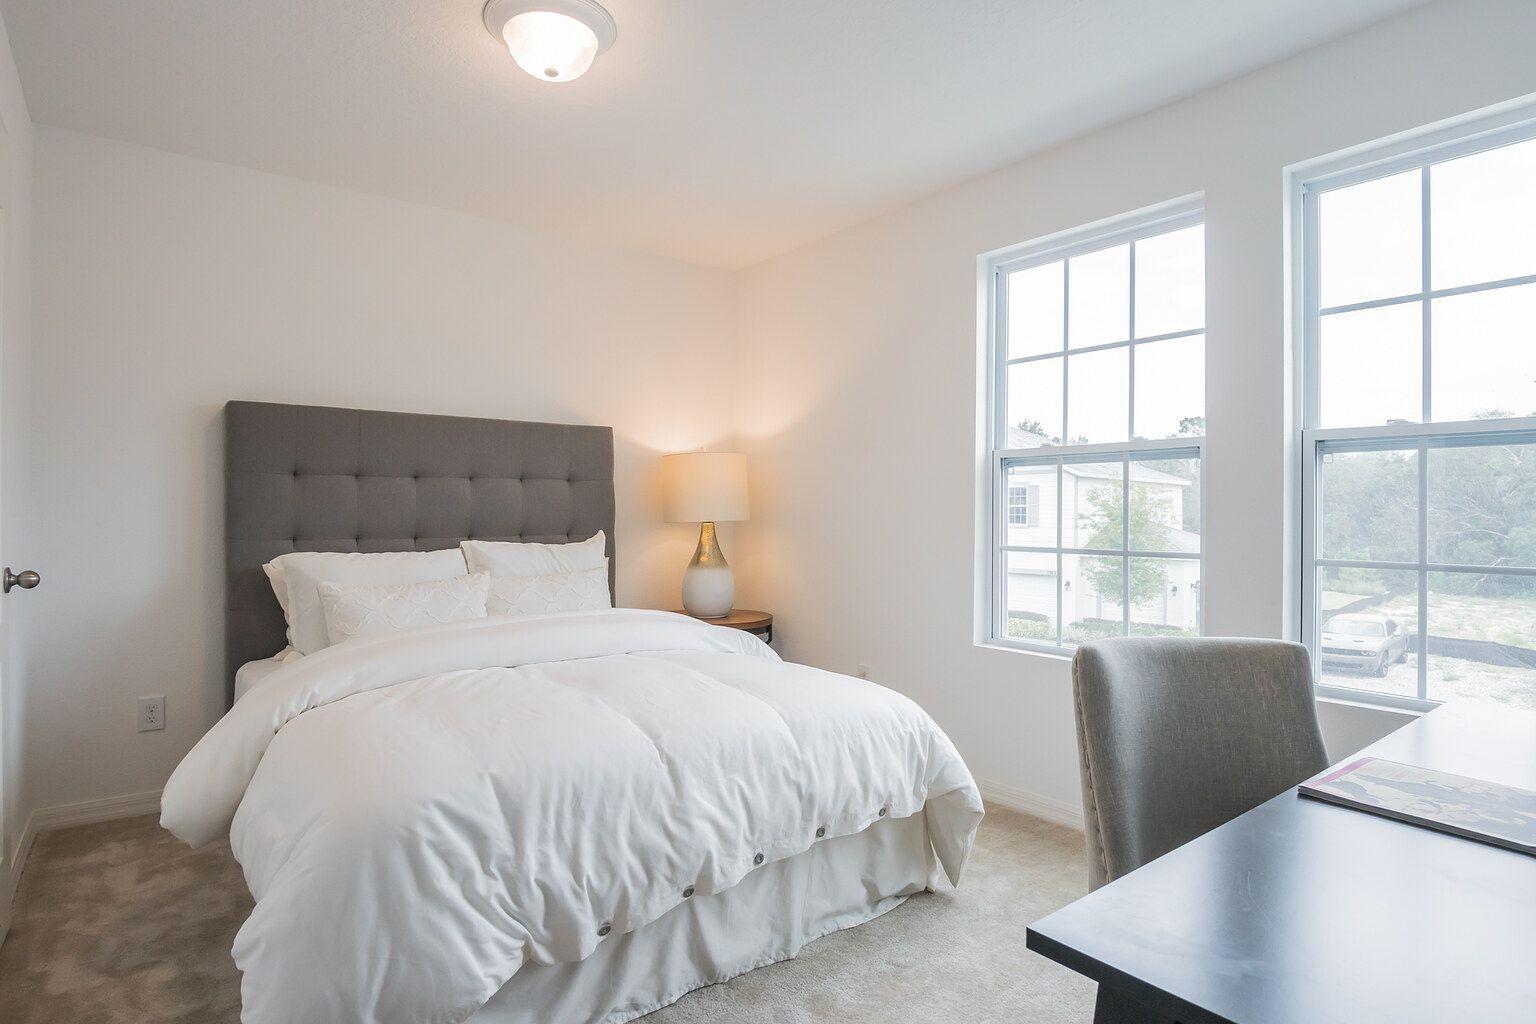 Bedroom featured in the Teton By Ashton Woods in Daytona Beach, FL